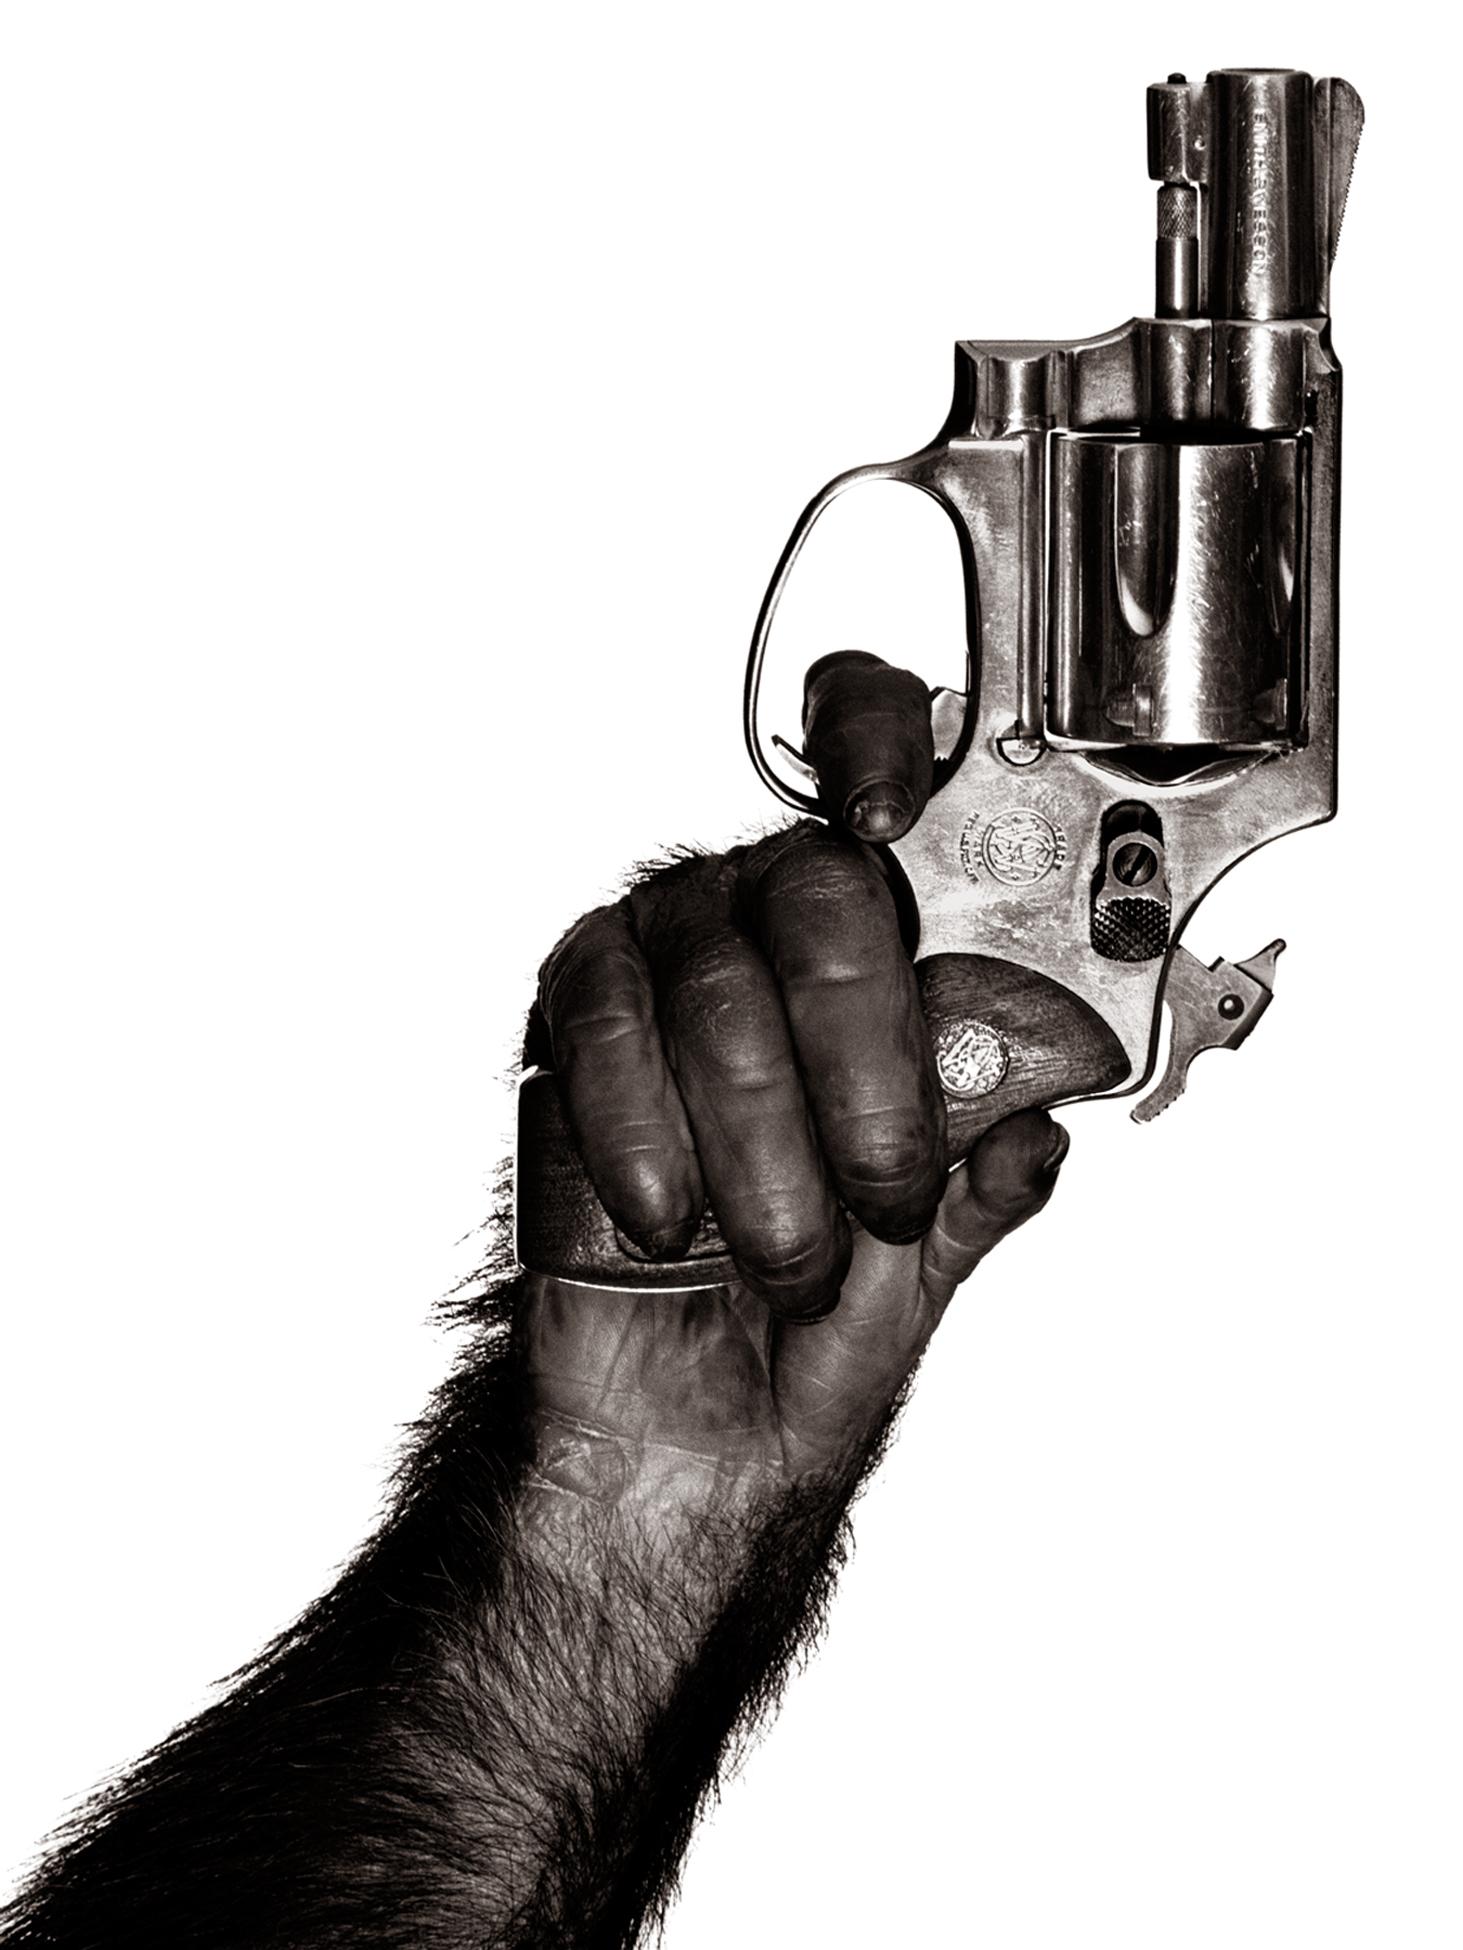 Monkey with gun by Albert Watson   Price on request